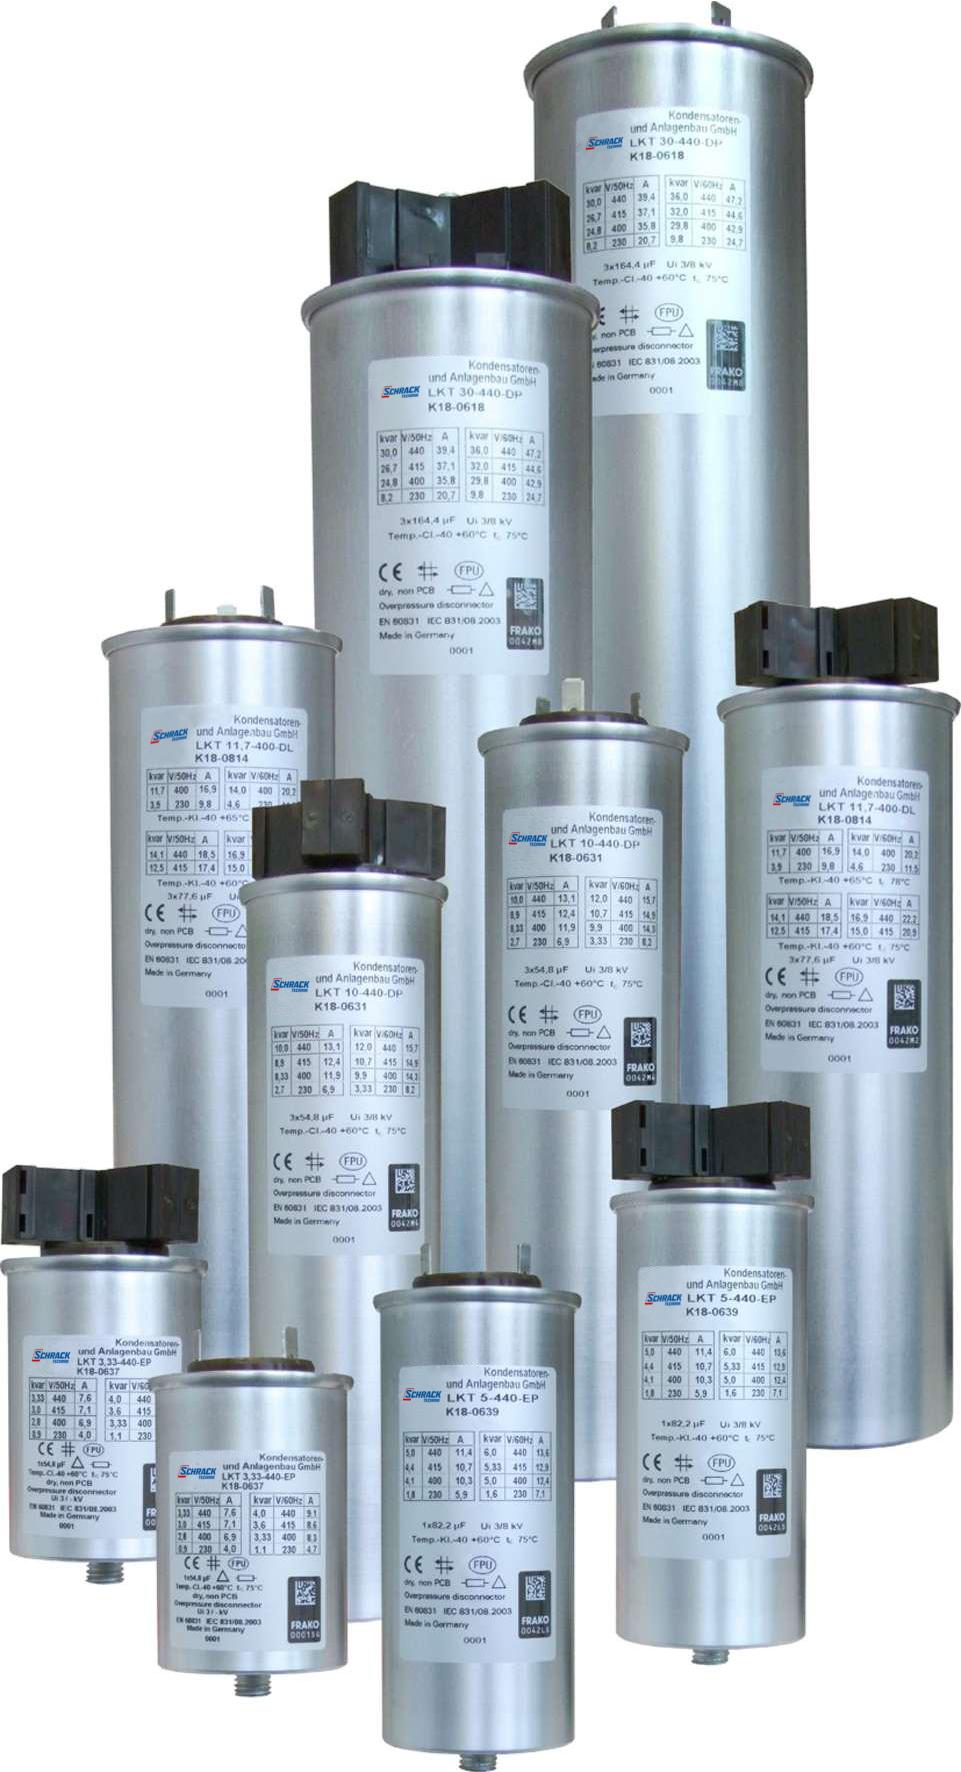 1 Stk Leistungskondensator 480V Qc=12,5kvar (400V) FRLK15548P